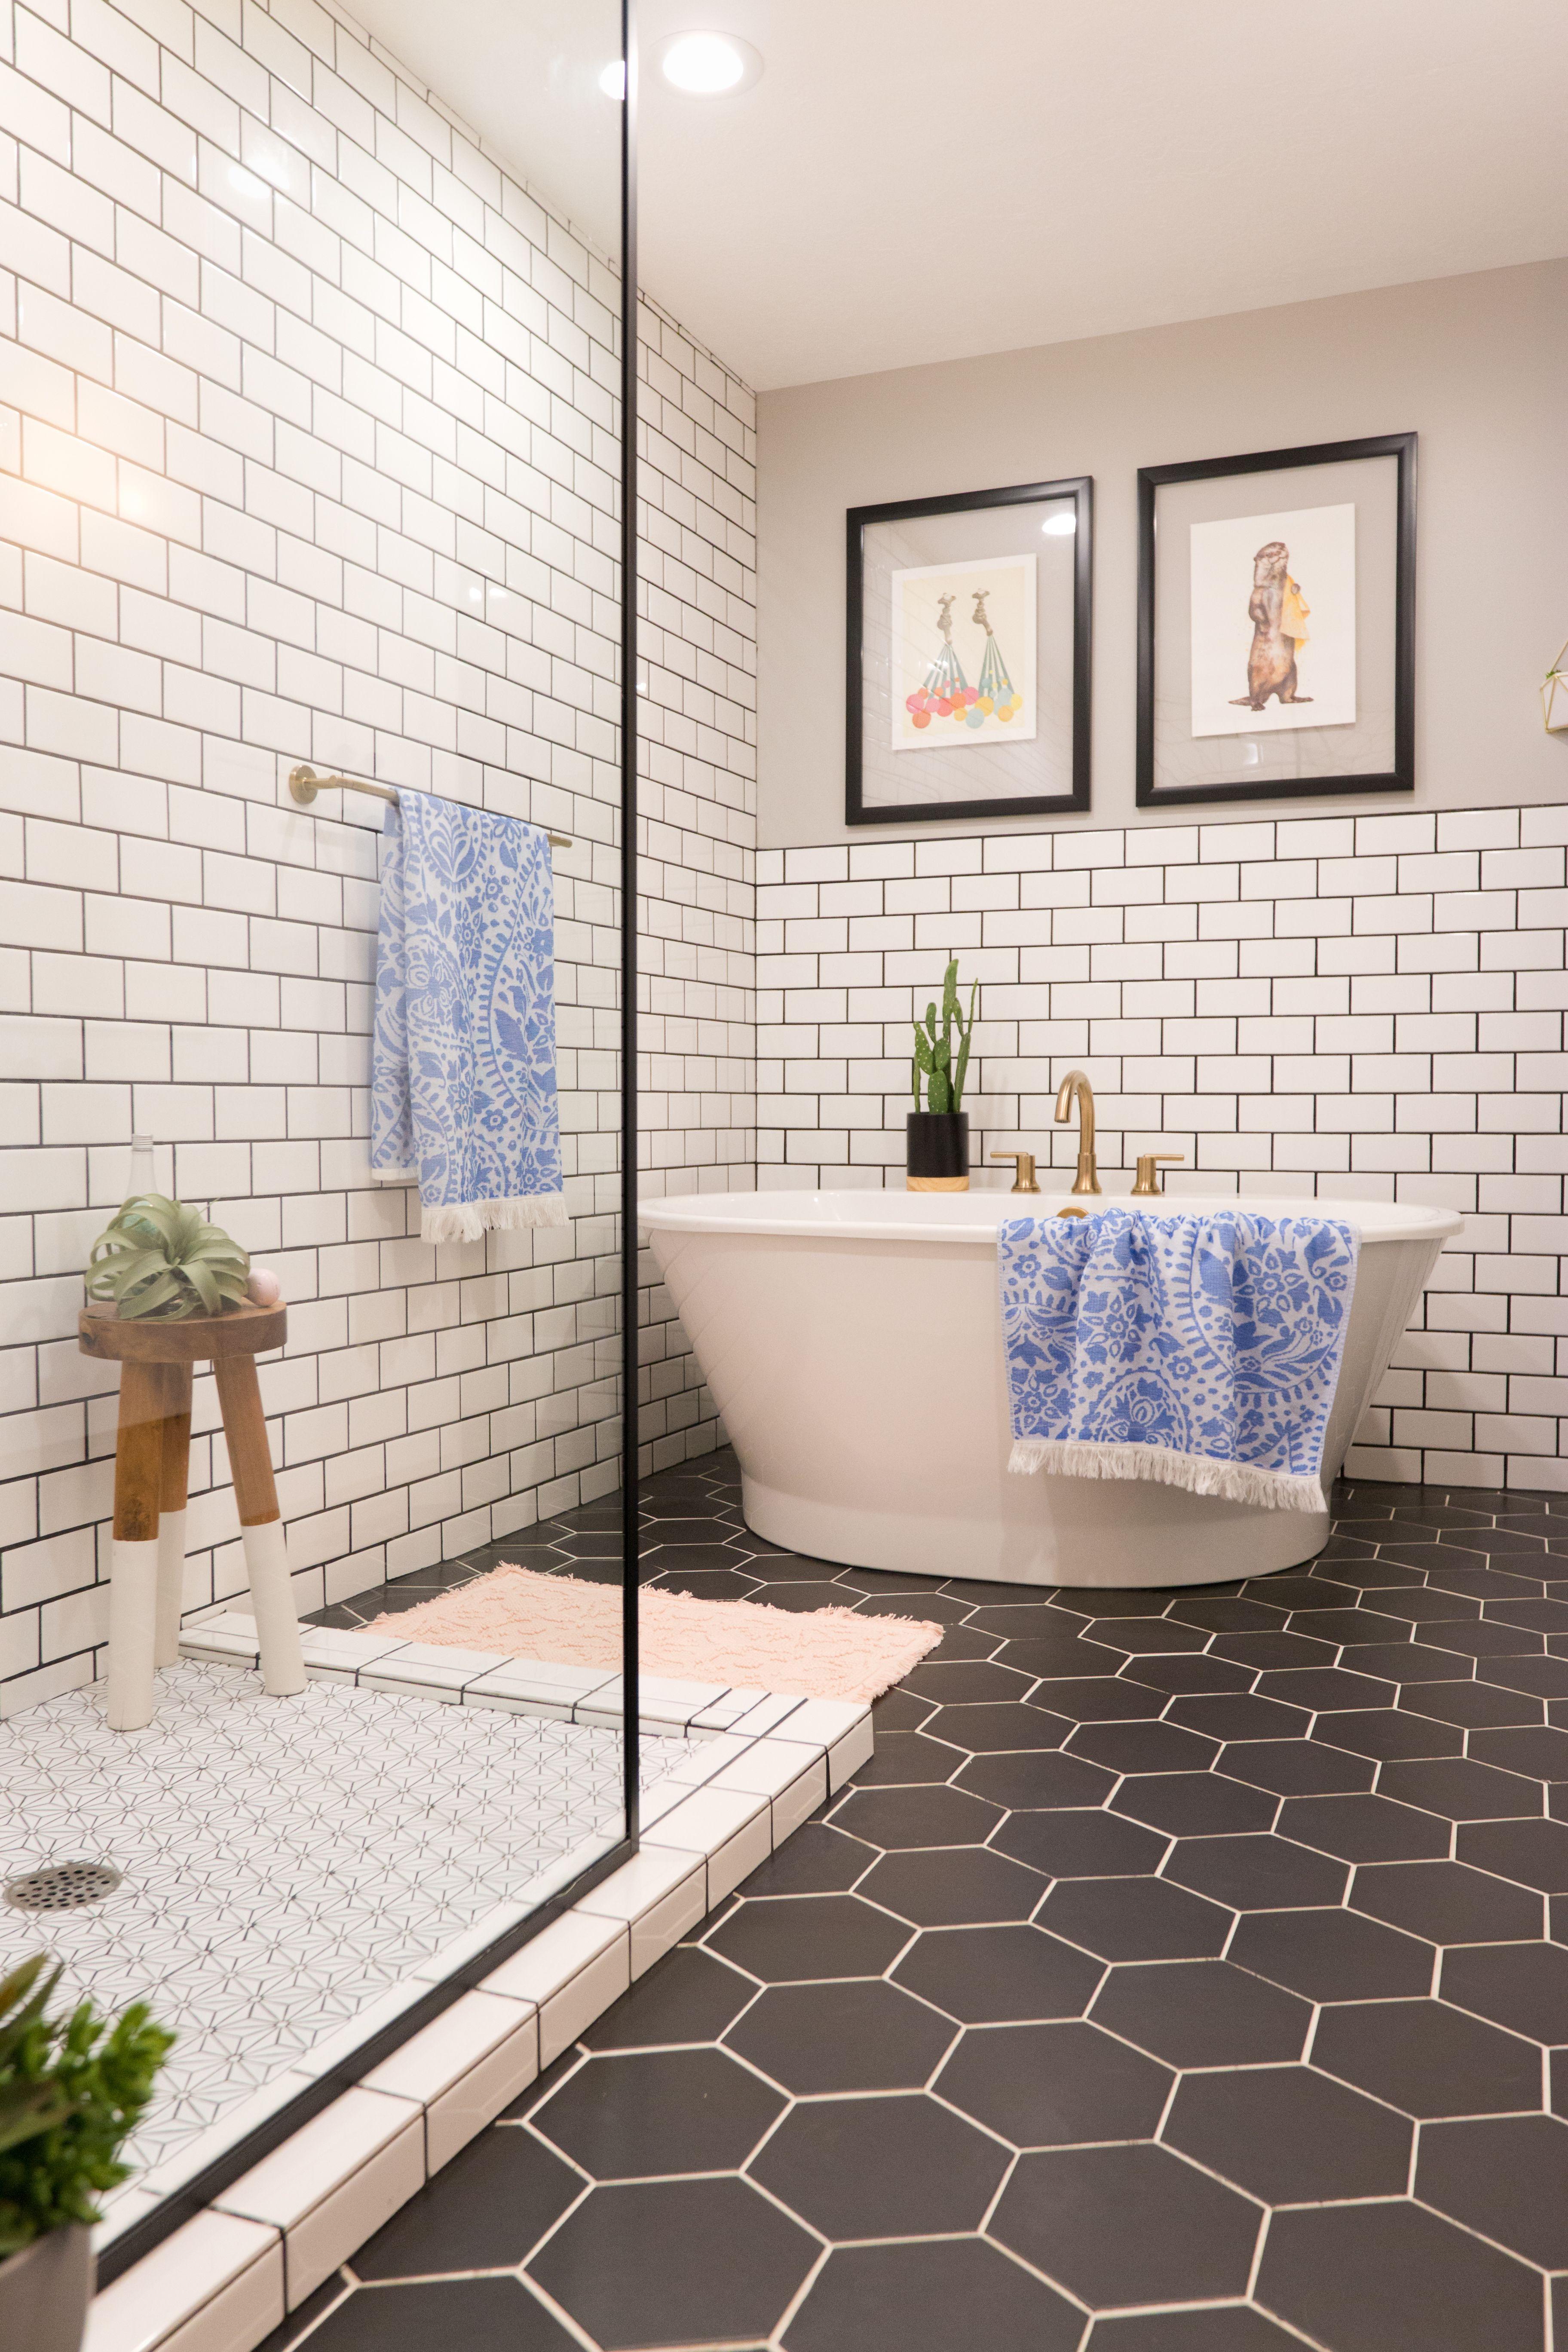 Midcentury Bathroom Black Hexagon Tile Subway Tile Bath White Bathroom Tiles Bathroom Tile Renovation Bathroom Shower Tile